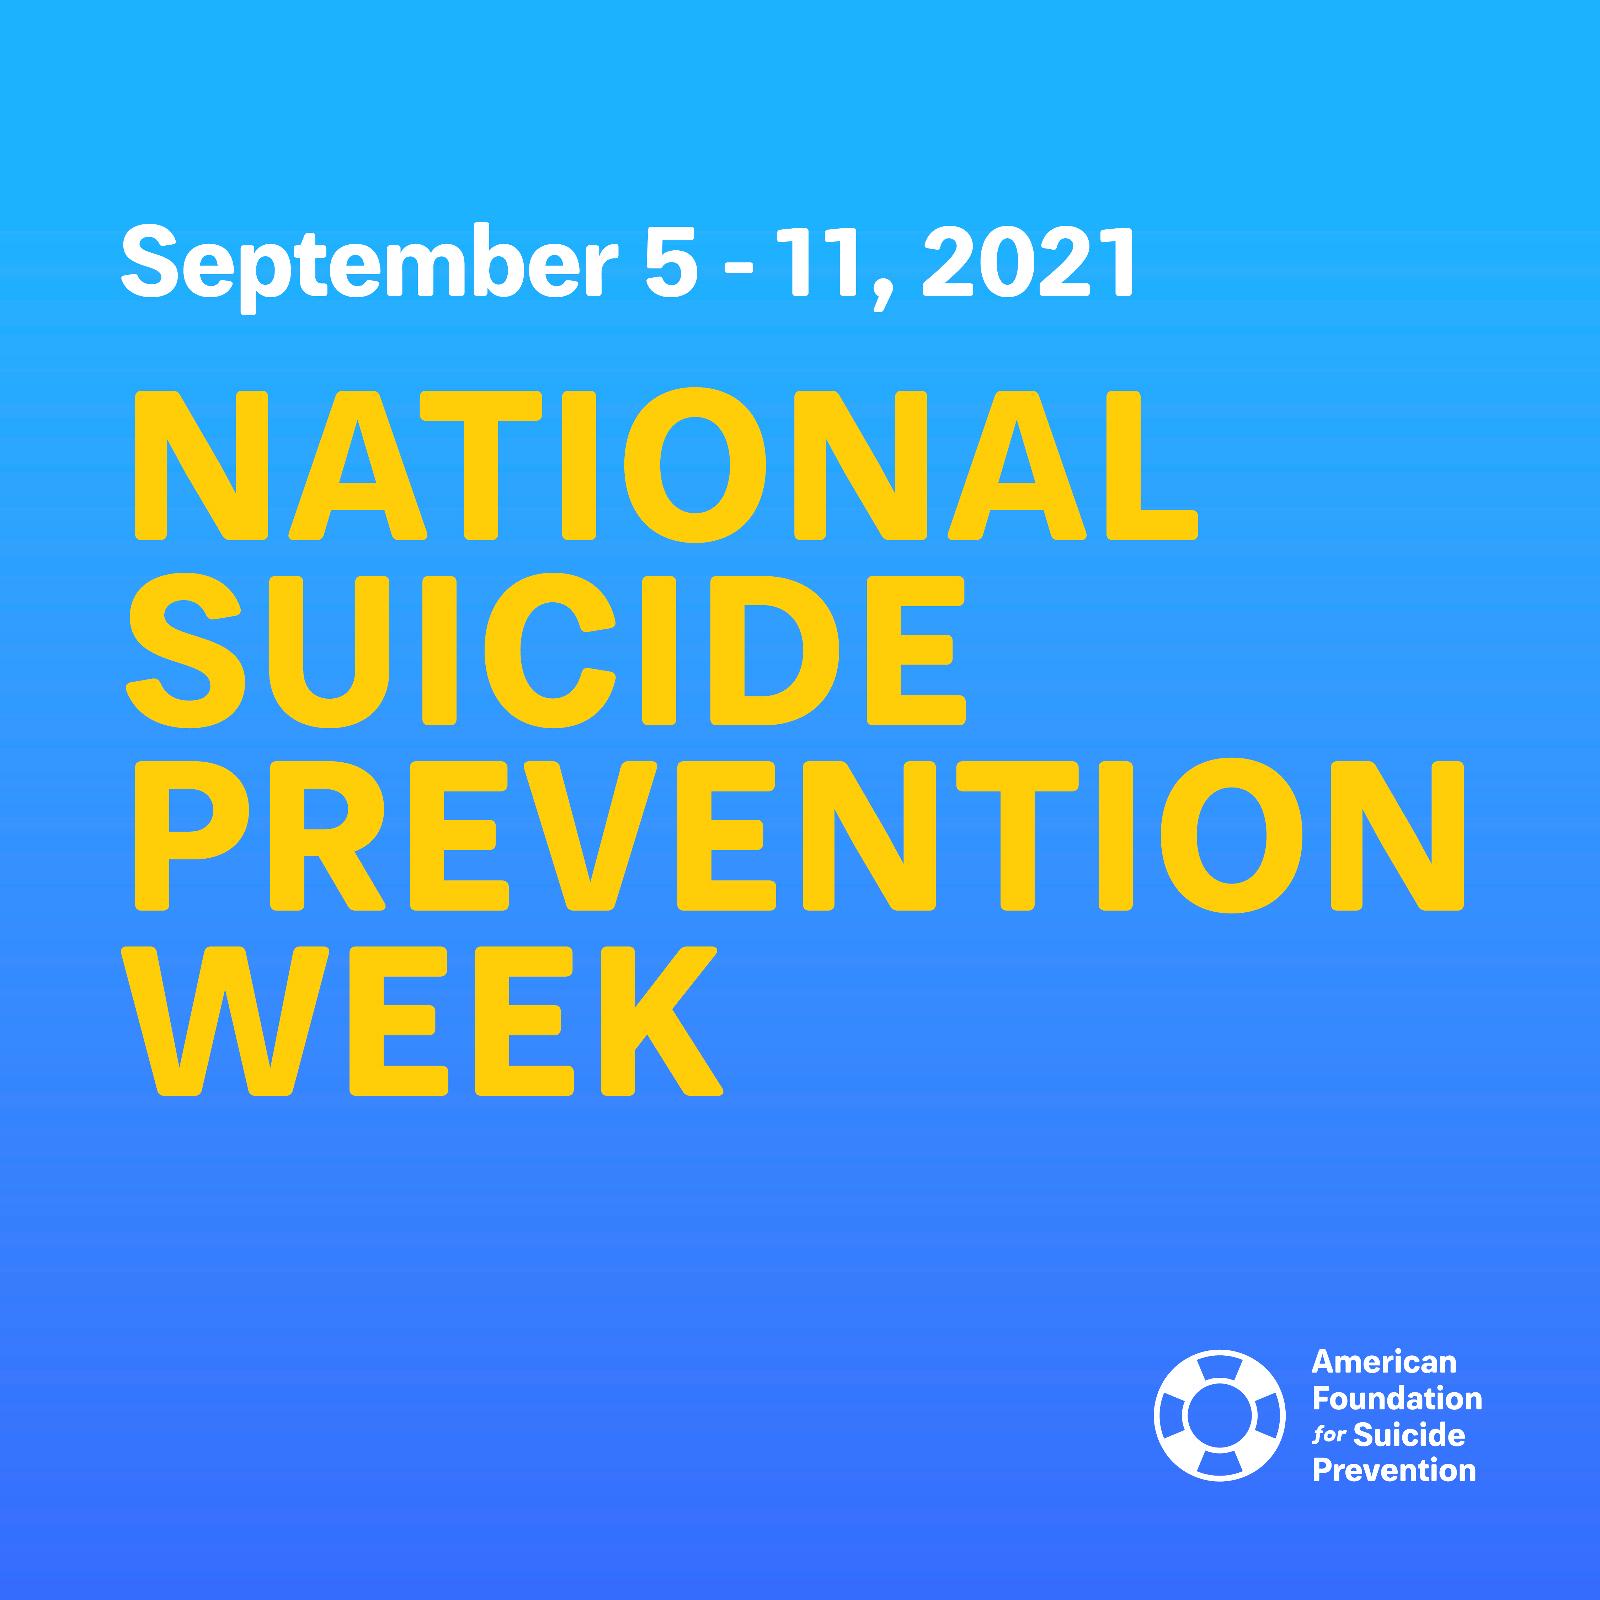 September 5-11, 2021 is National Suicide Prevention Week